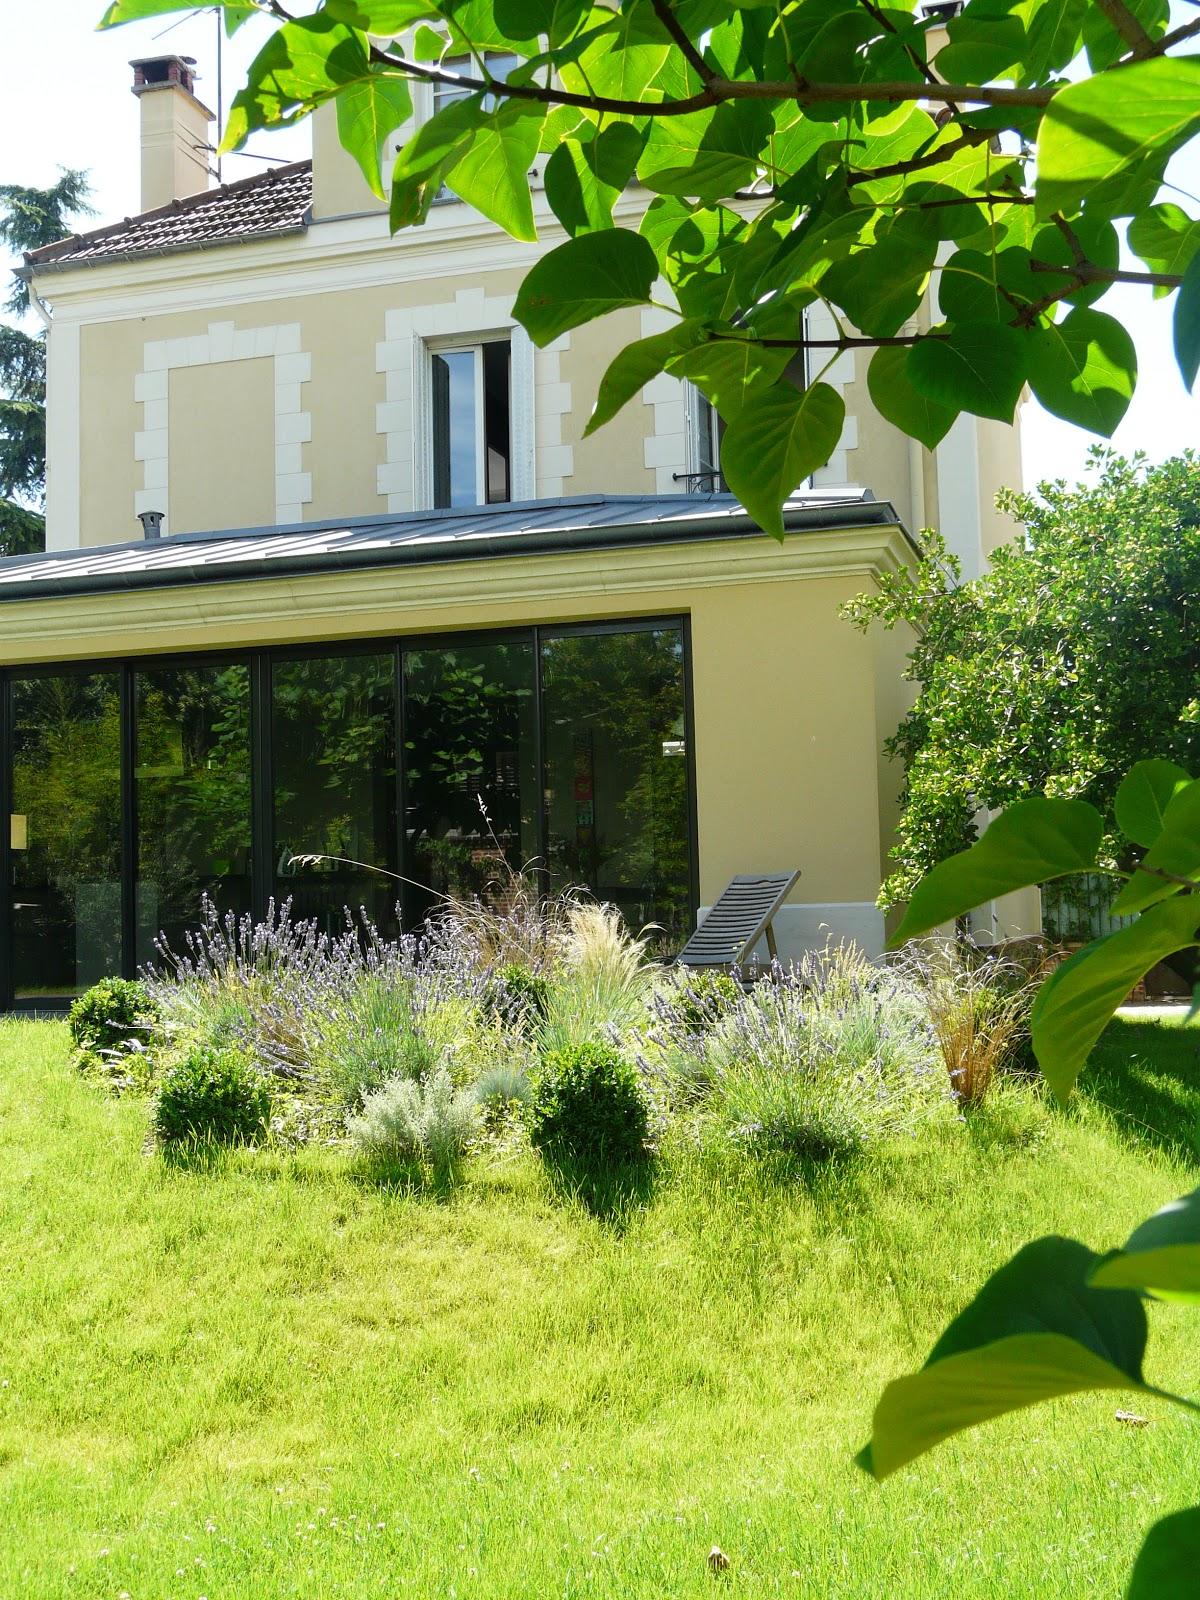 Anna grant jardin la garenne colombes - Jardin fleuri lyon colombes ...